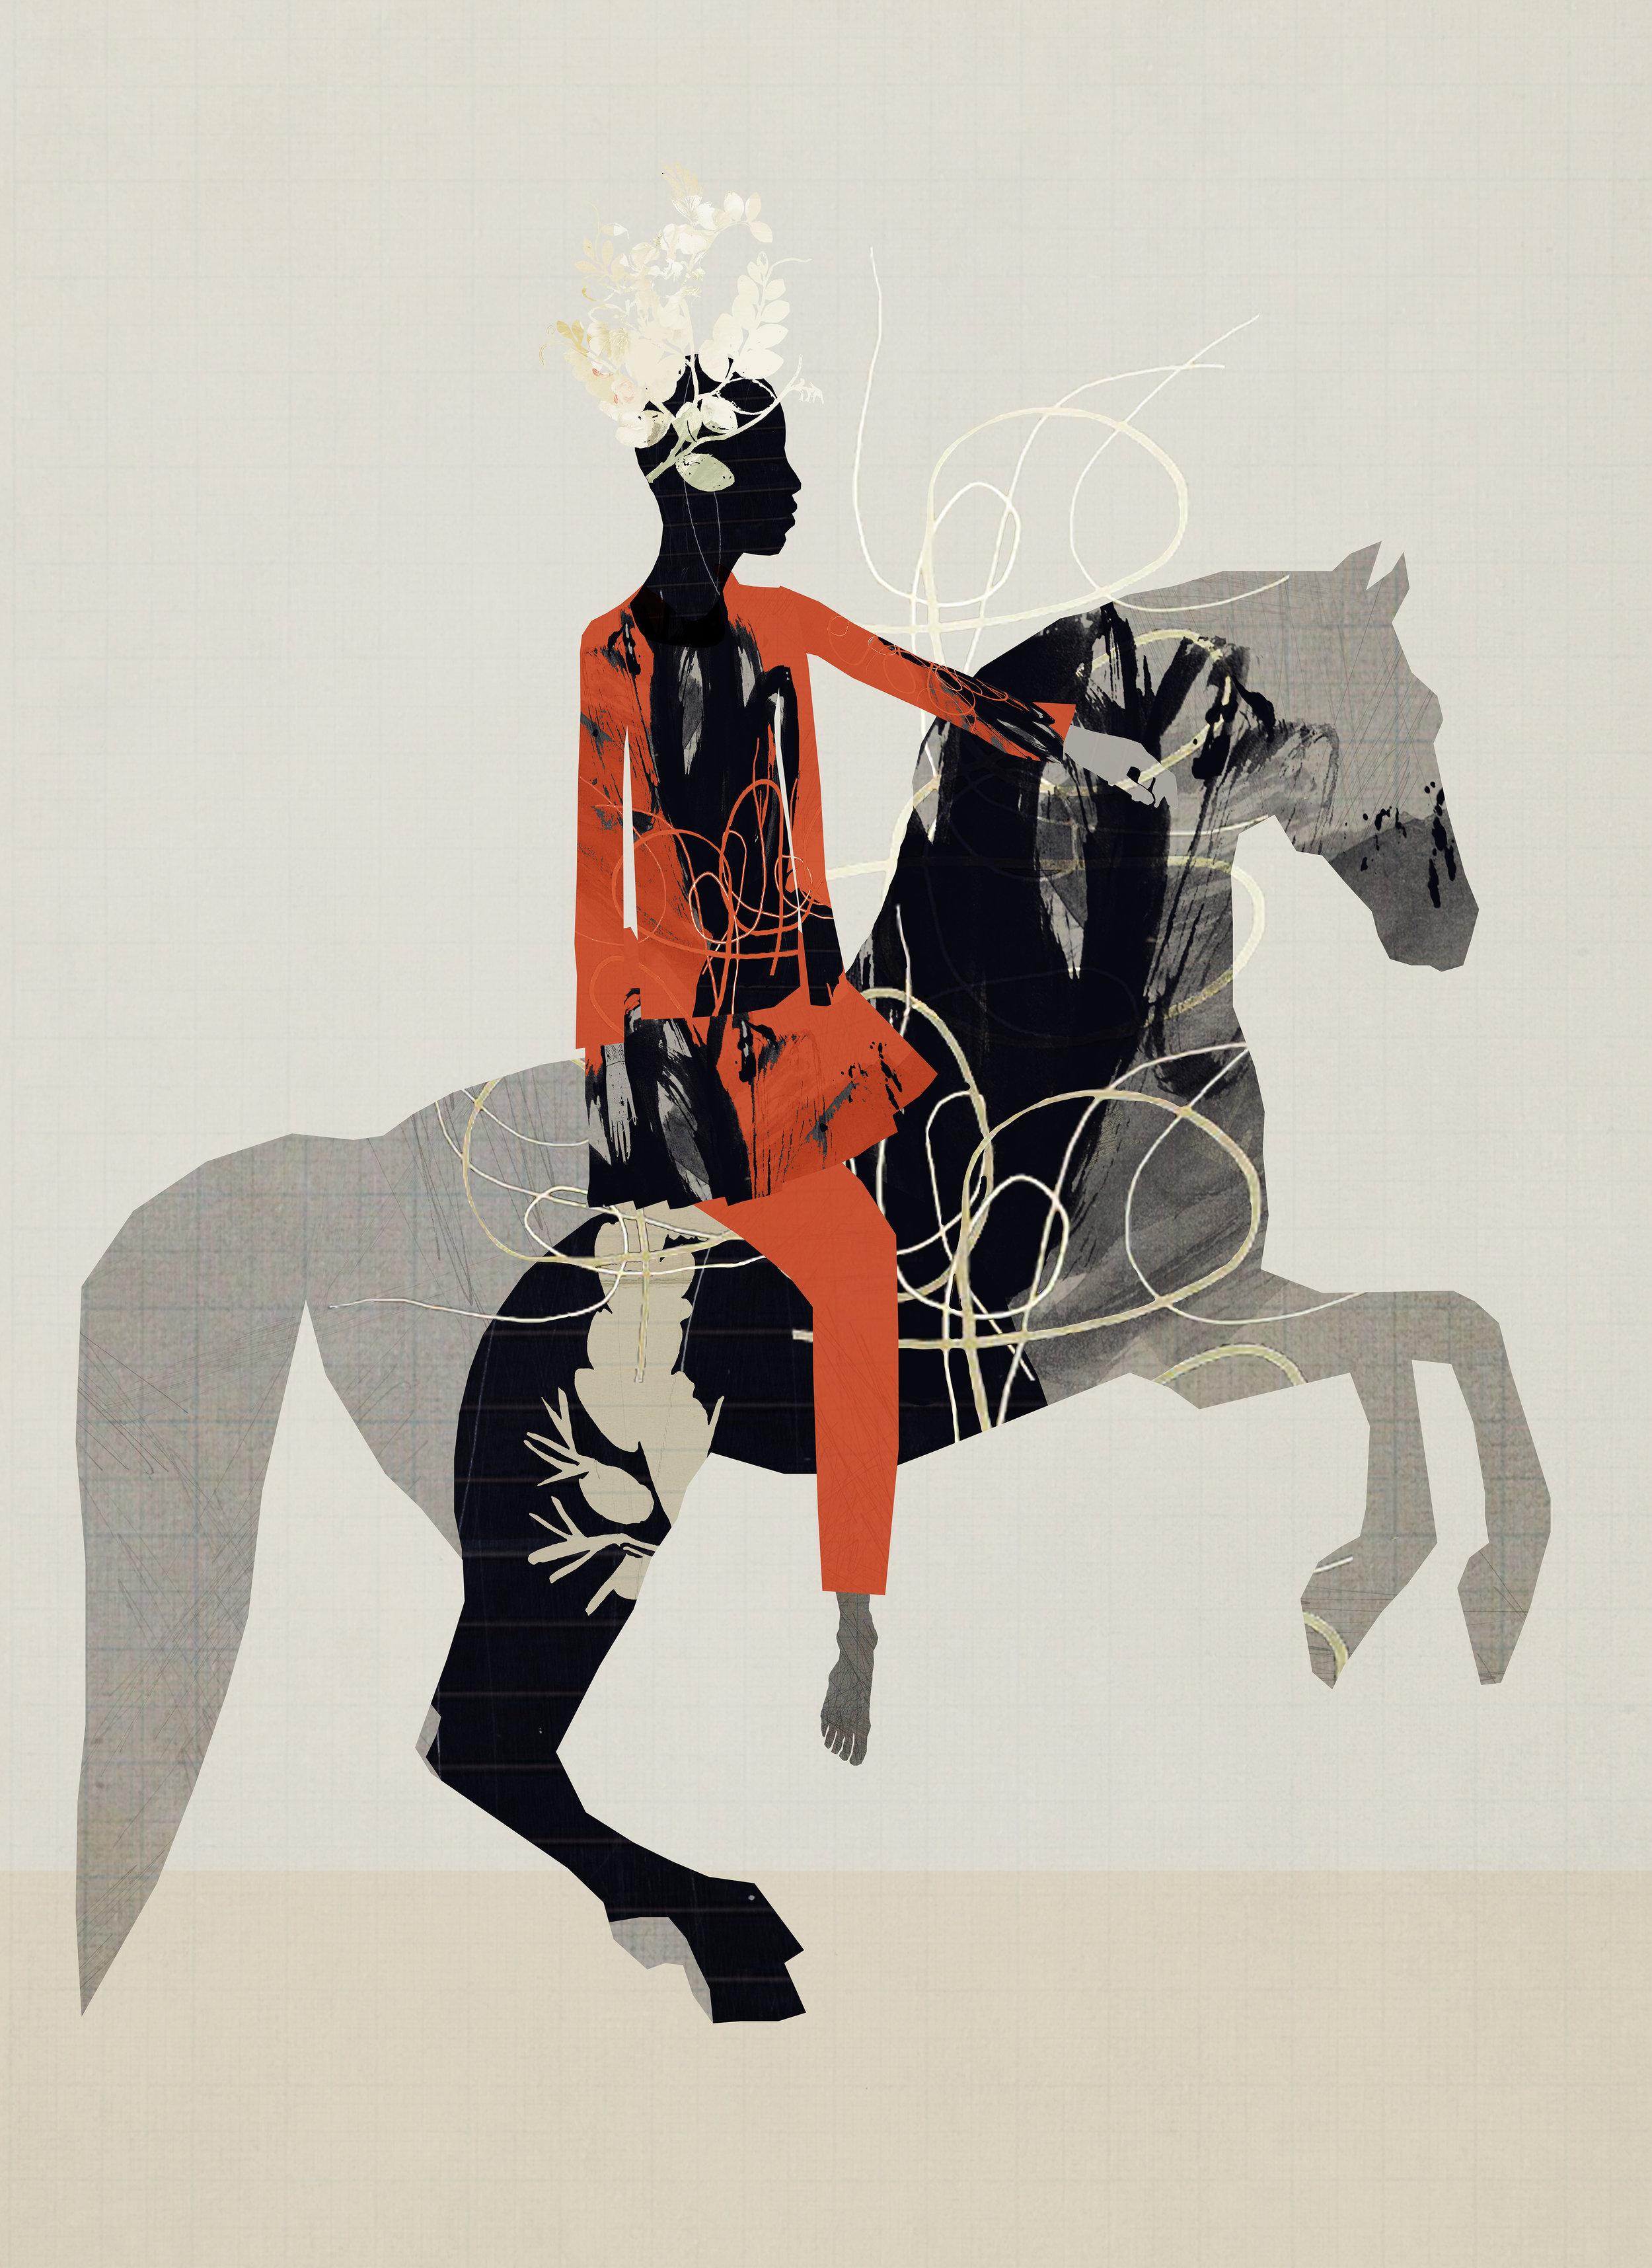 horse and rider sm.jpg